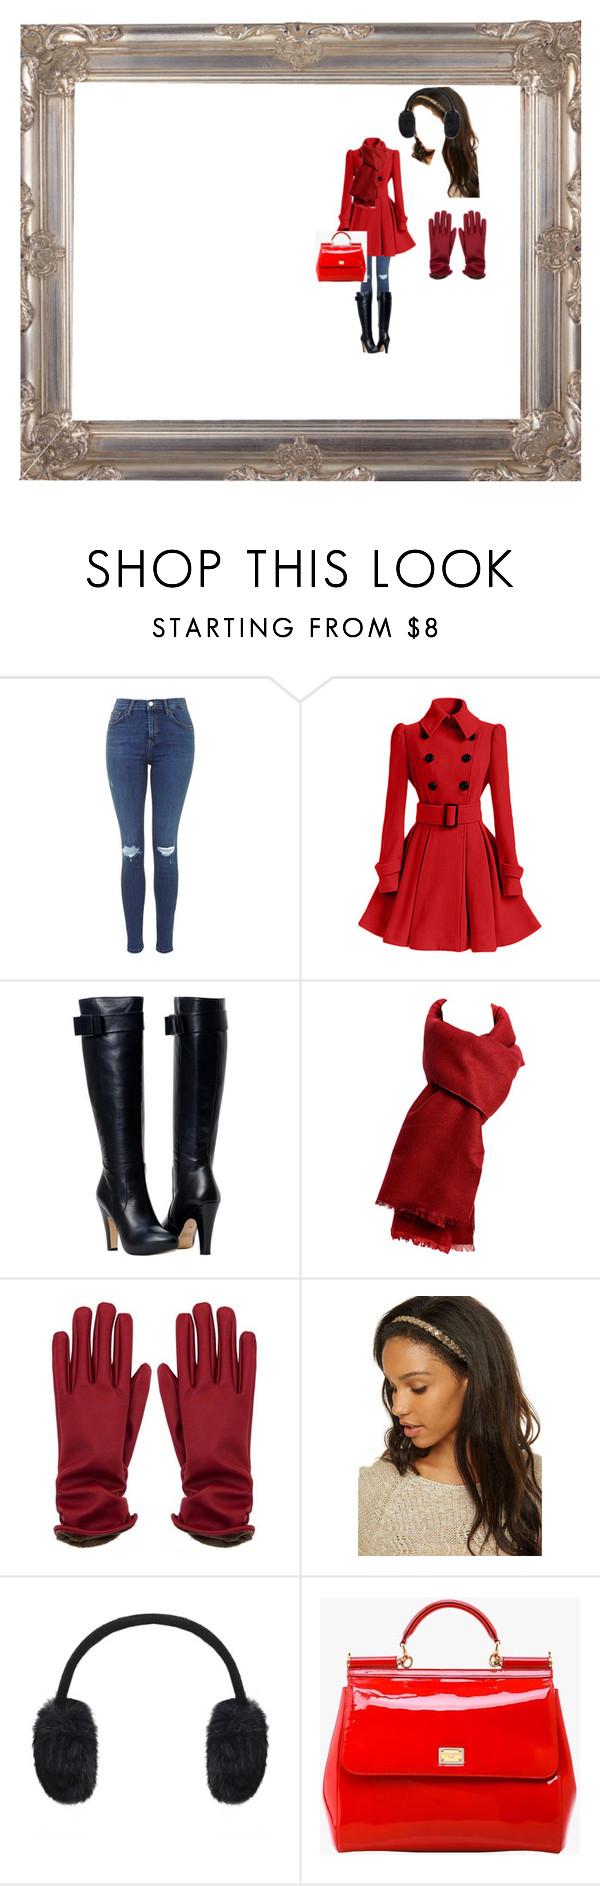 """Winter Wear"" by ariya1 on Polyvore featuring Kurt Geiger and Dolce&Gabbana"